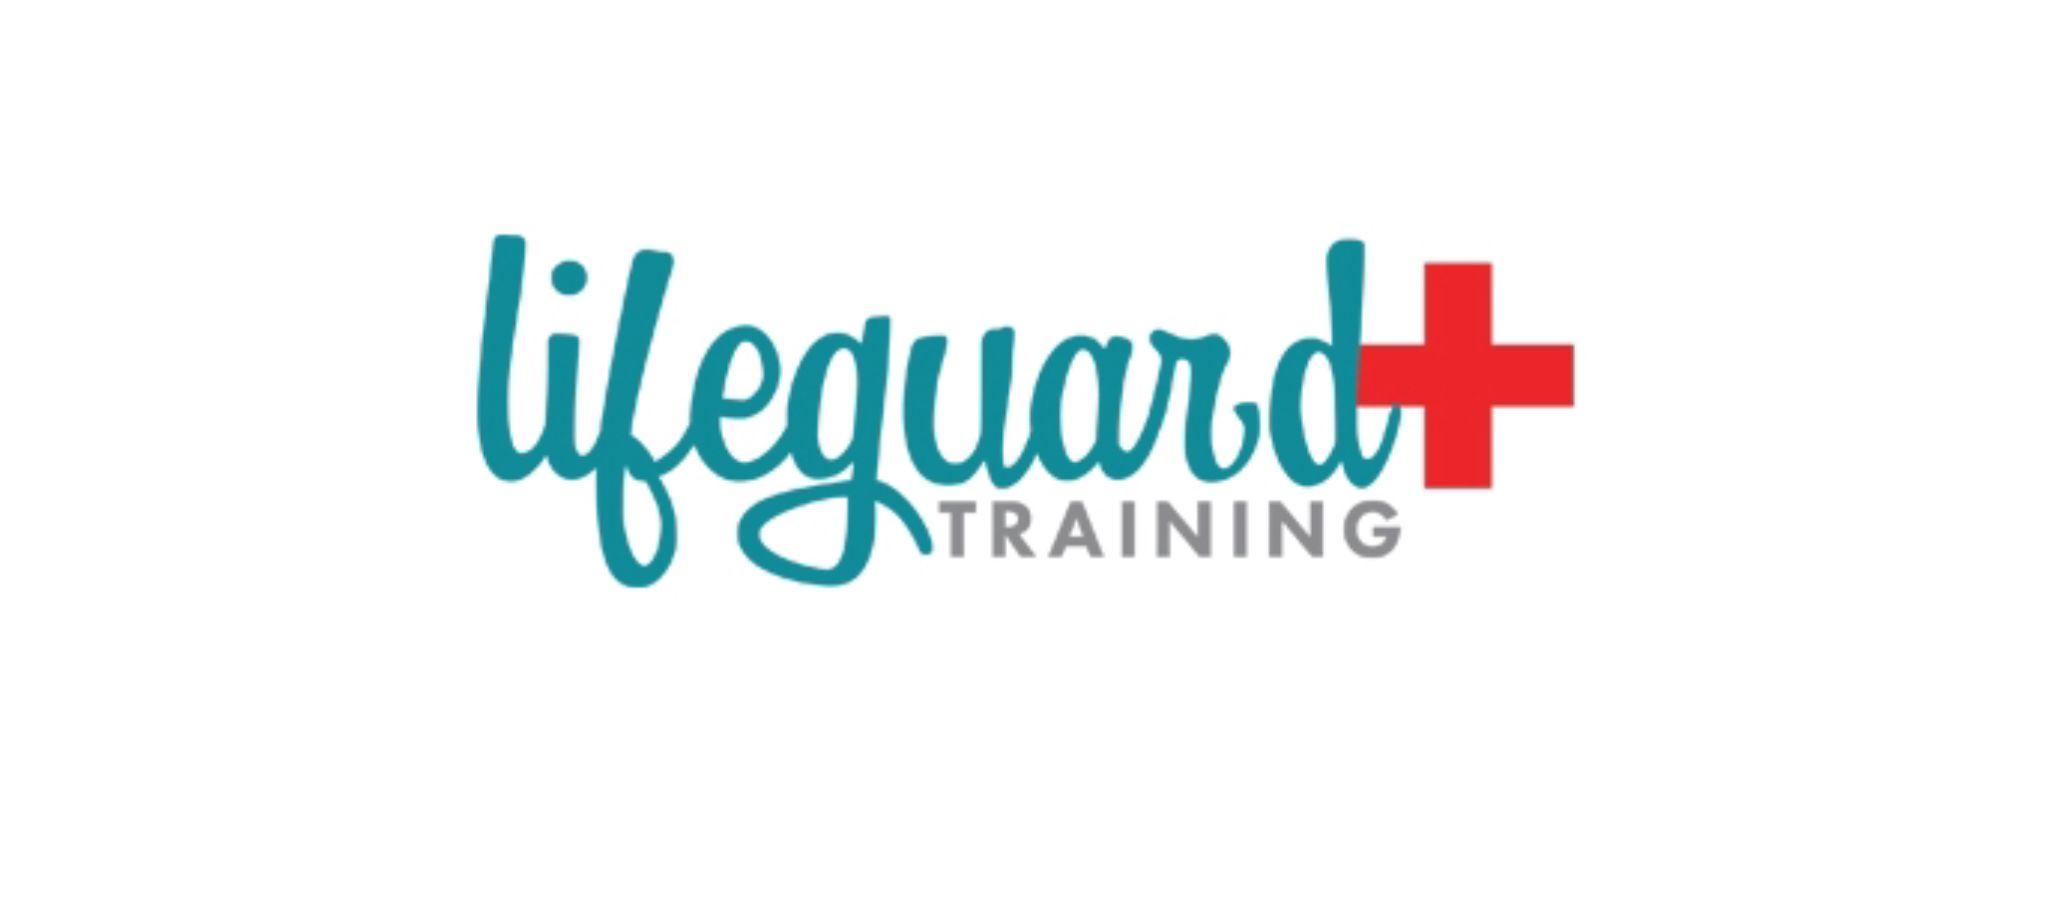 Lifeguard training activities for teens after school